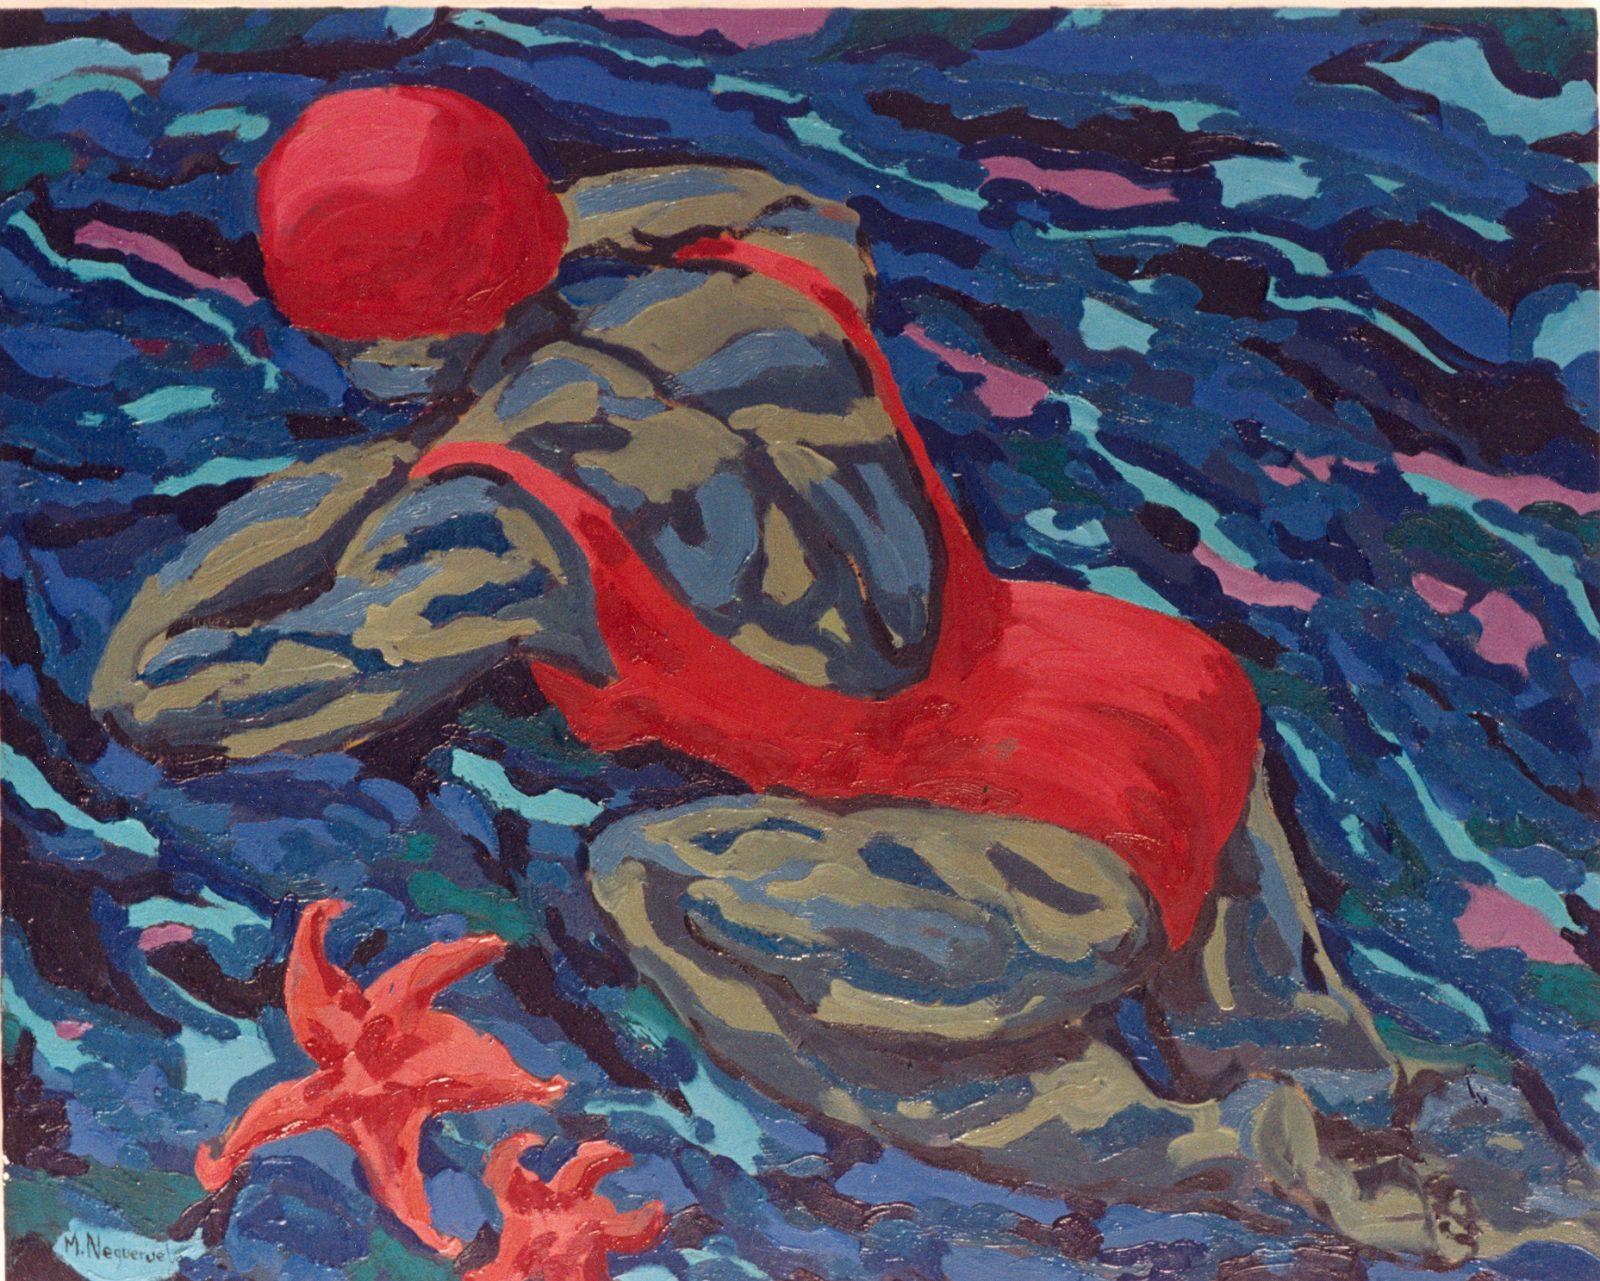 Bañista con estrella de mar